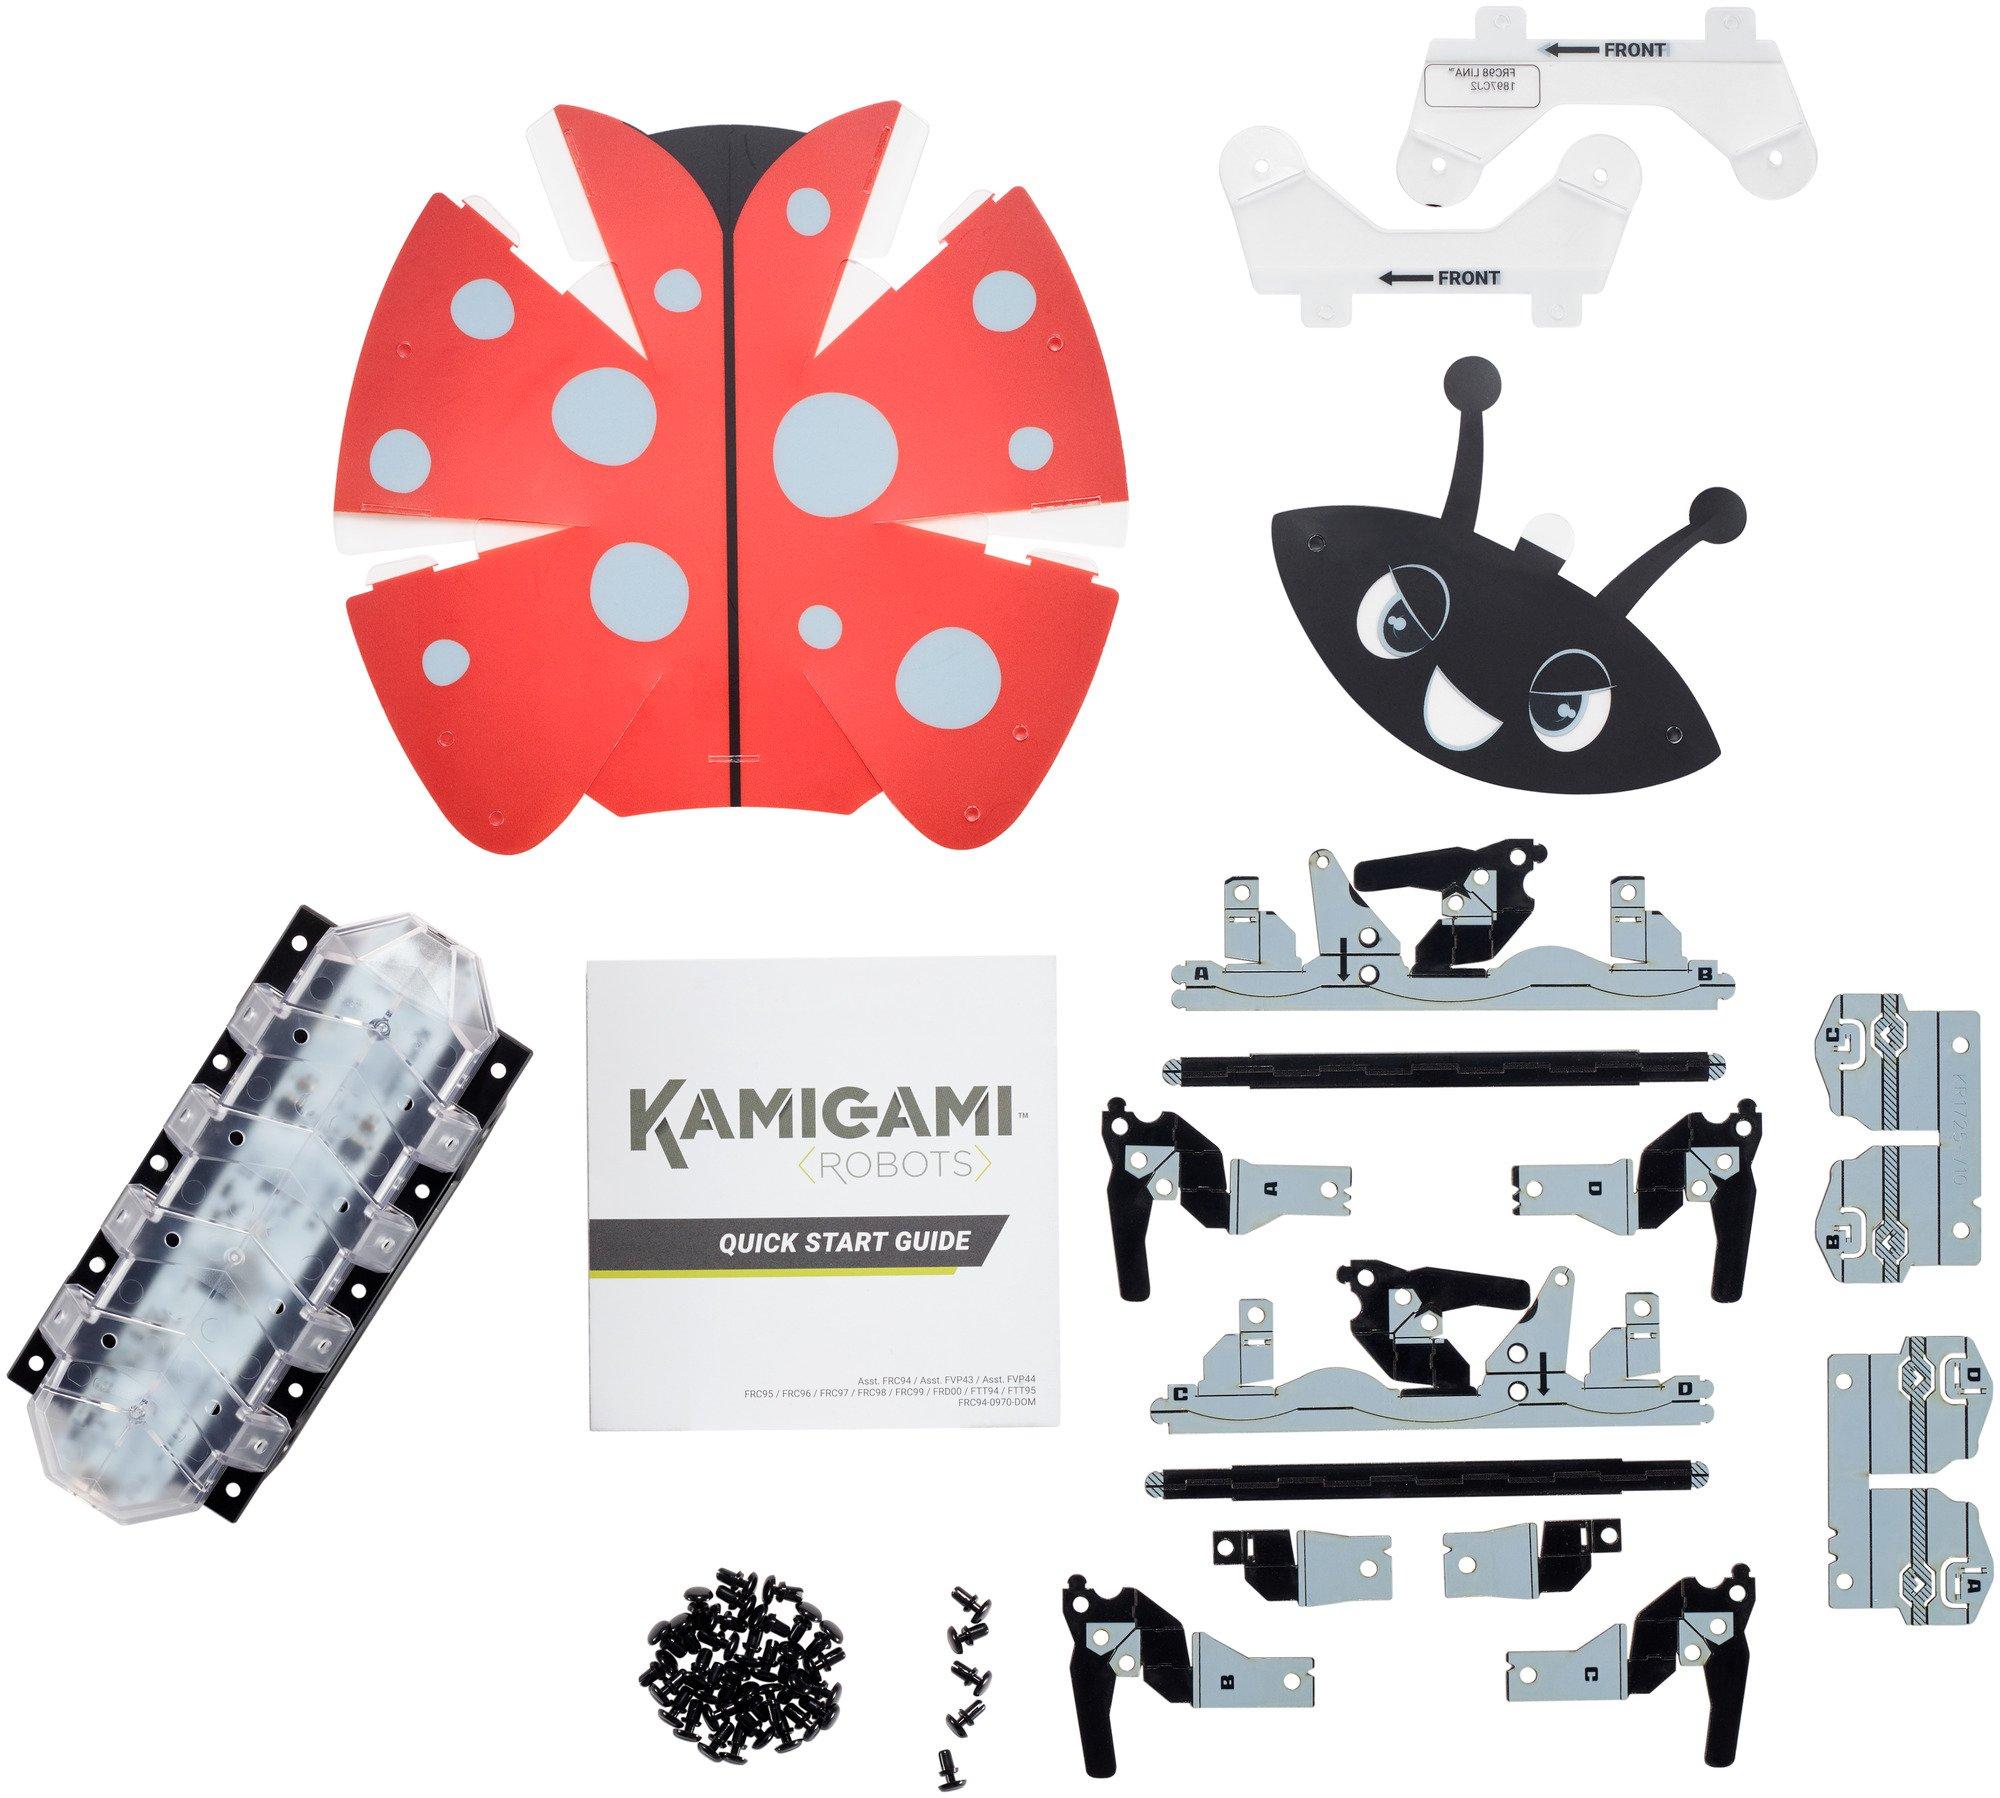 Kamigami Lina Robot by Mattel (Image #4)